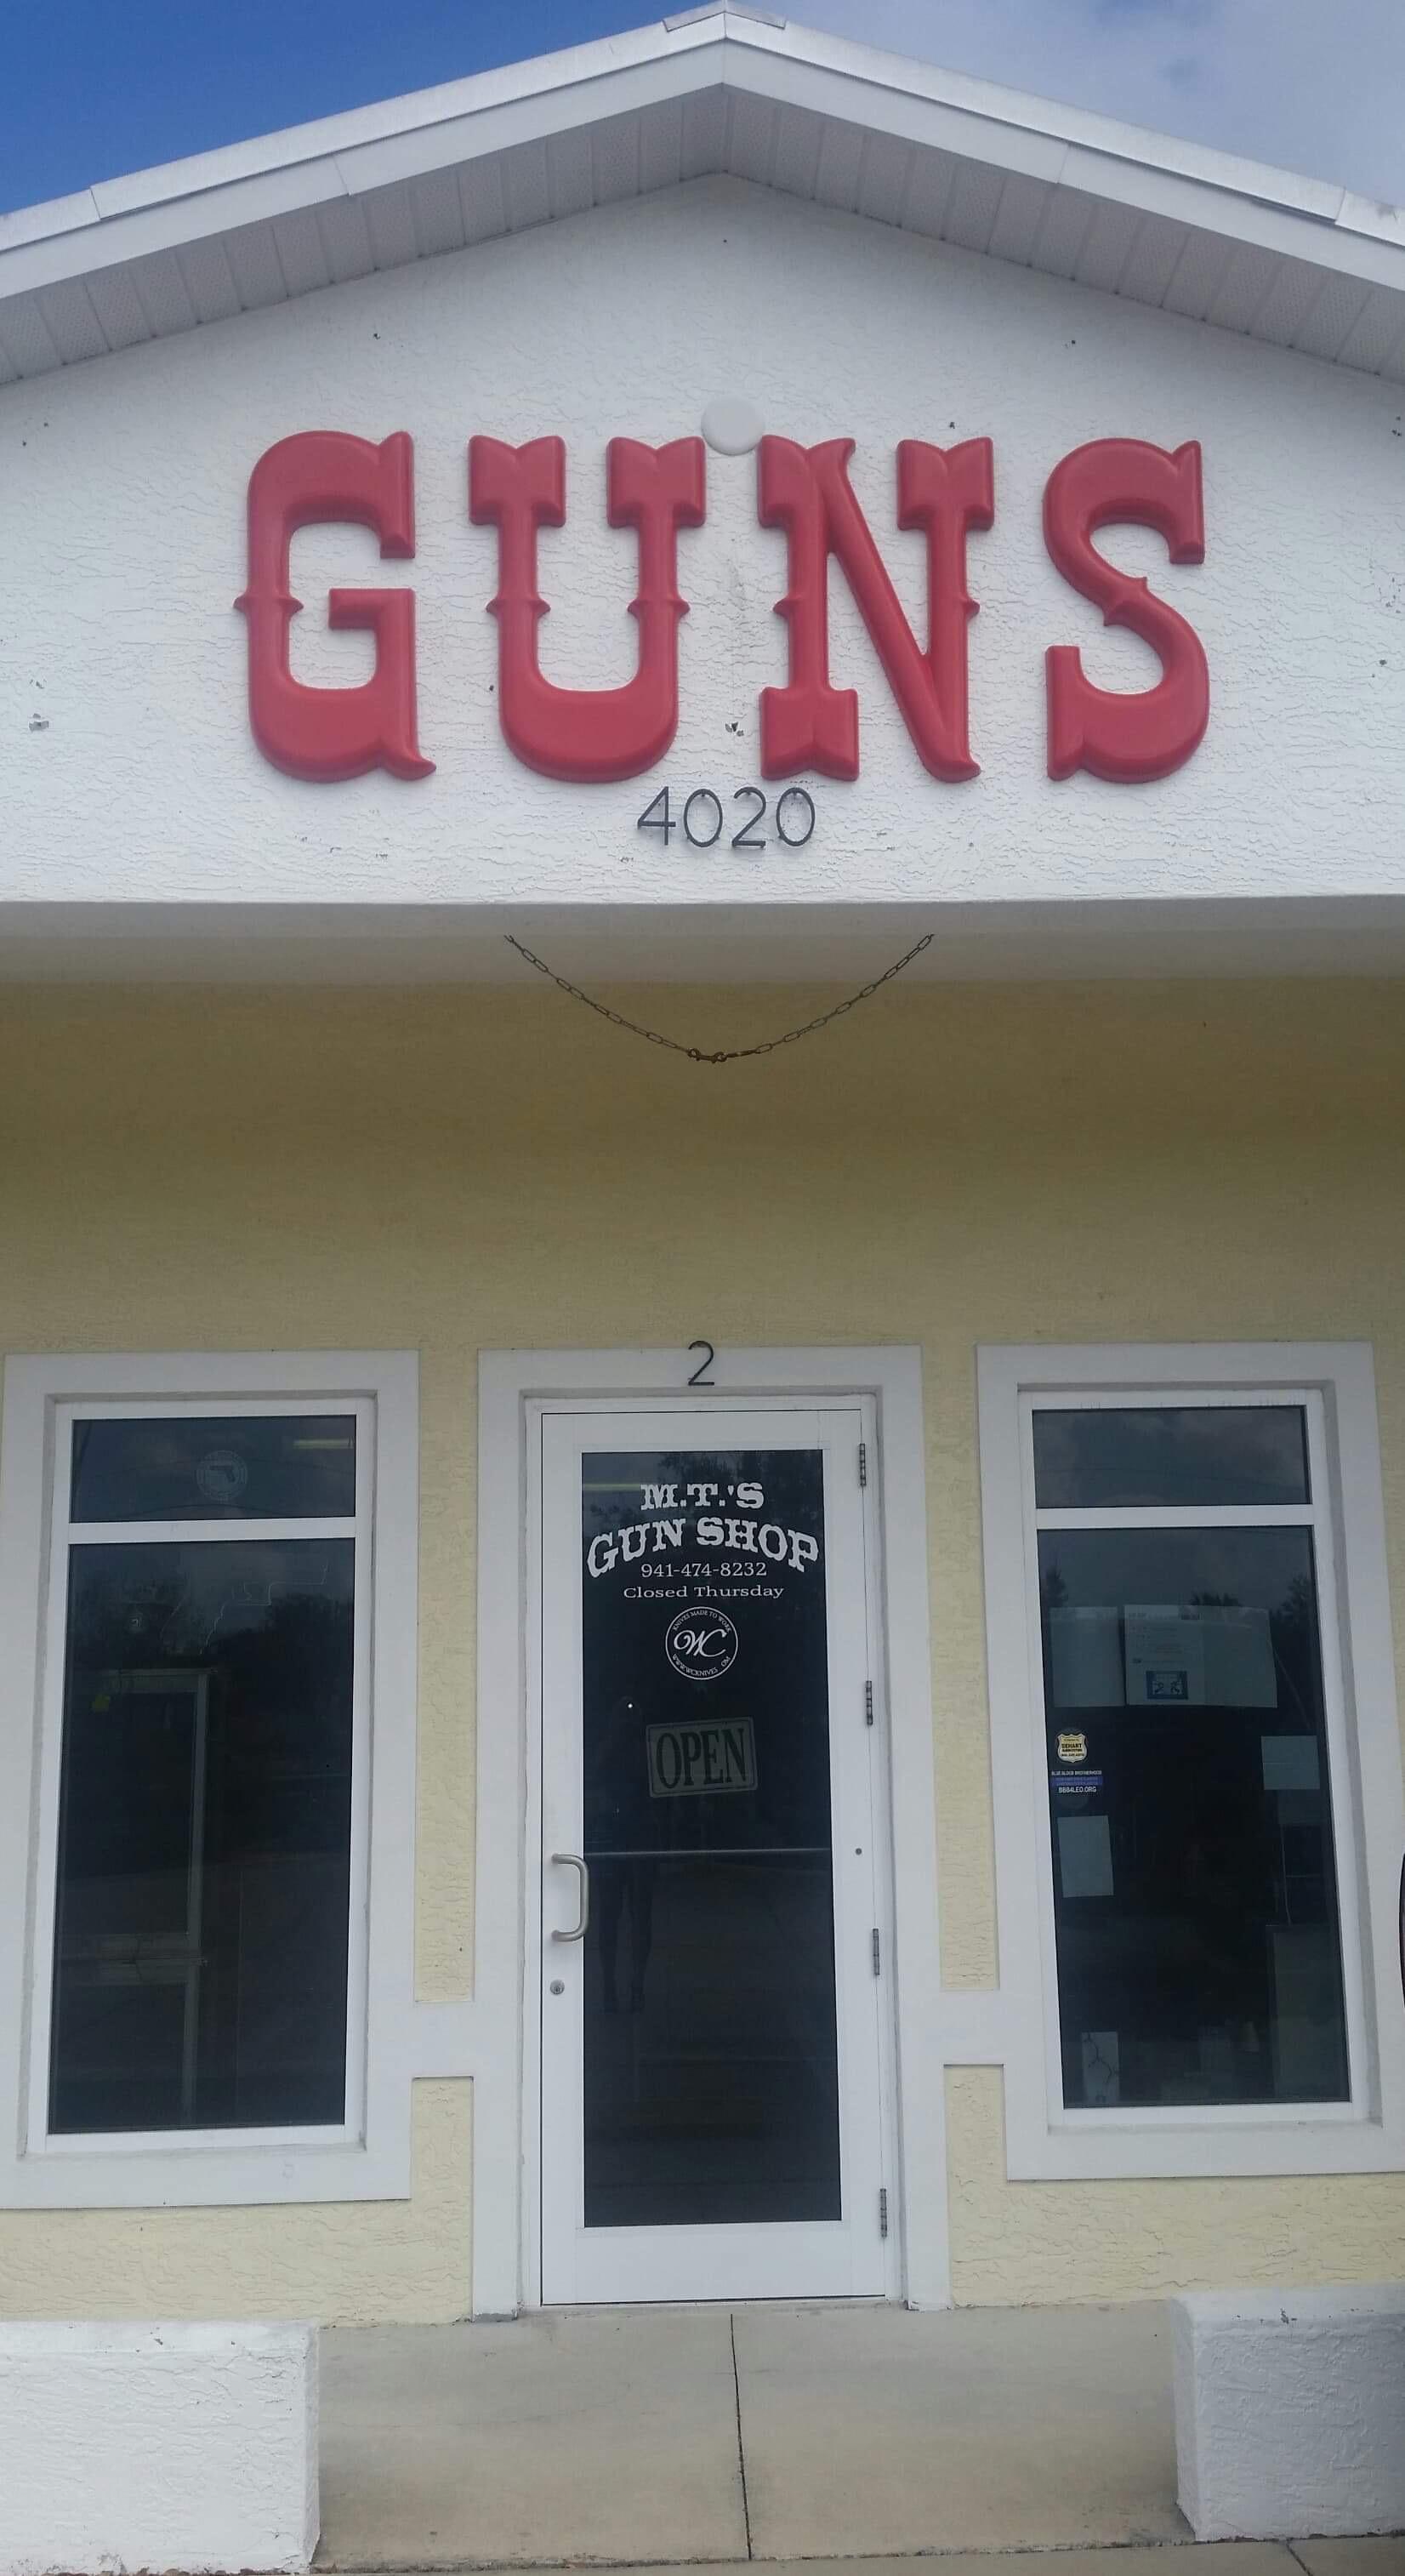 M.T.'s Gun Shop. Inc. - 4020 N. Access Rd. Unit 2Englewood, FL. 34224Contact Vern Kohlenberg : 941 474 8232NO WEBSITE